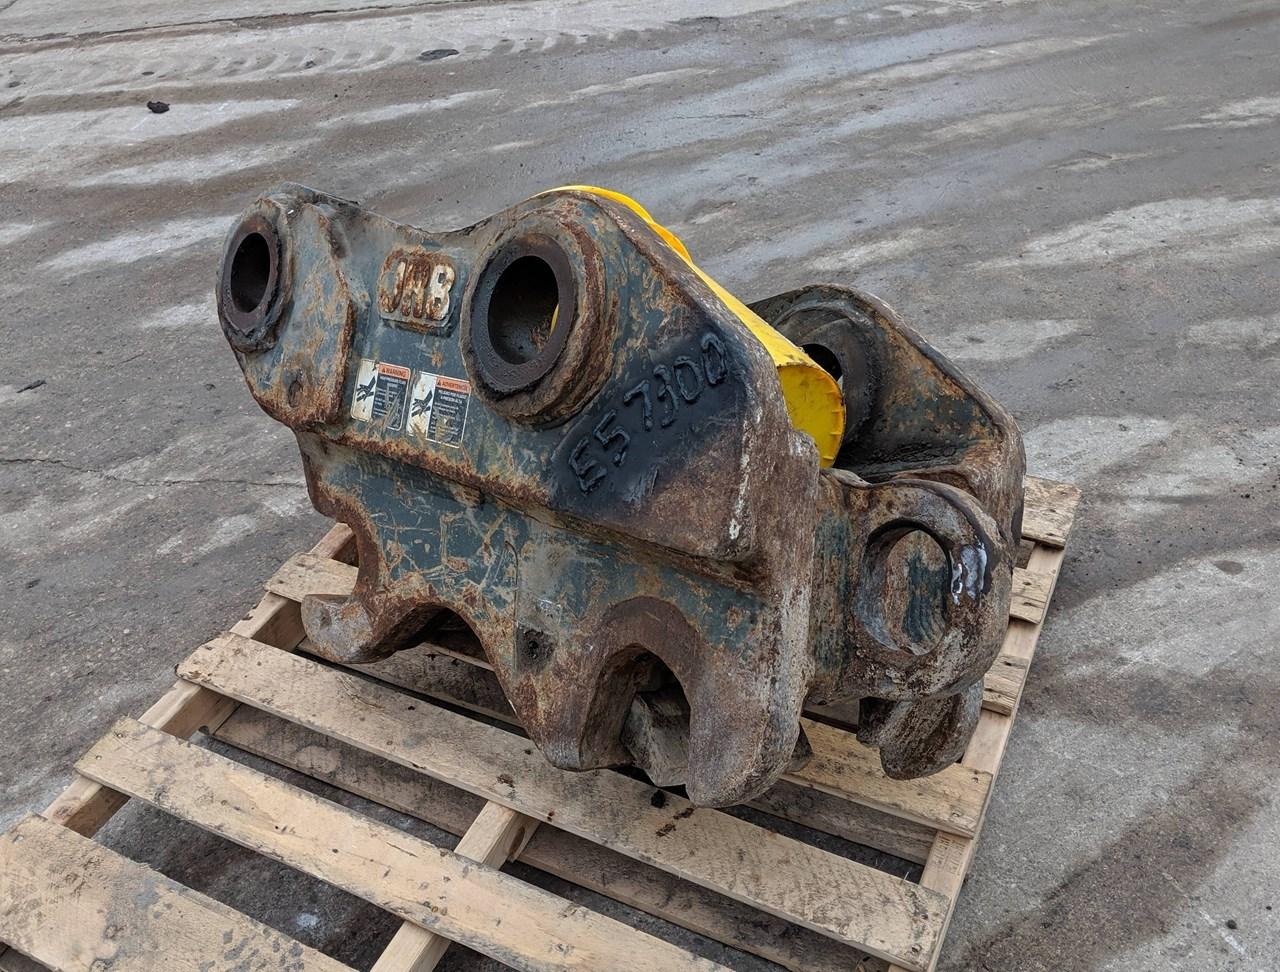 2017 JRB PC400QC Excavator Coupler For Sale